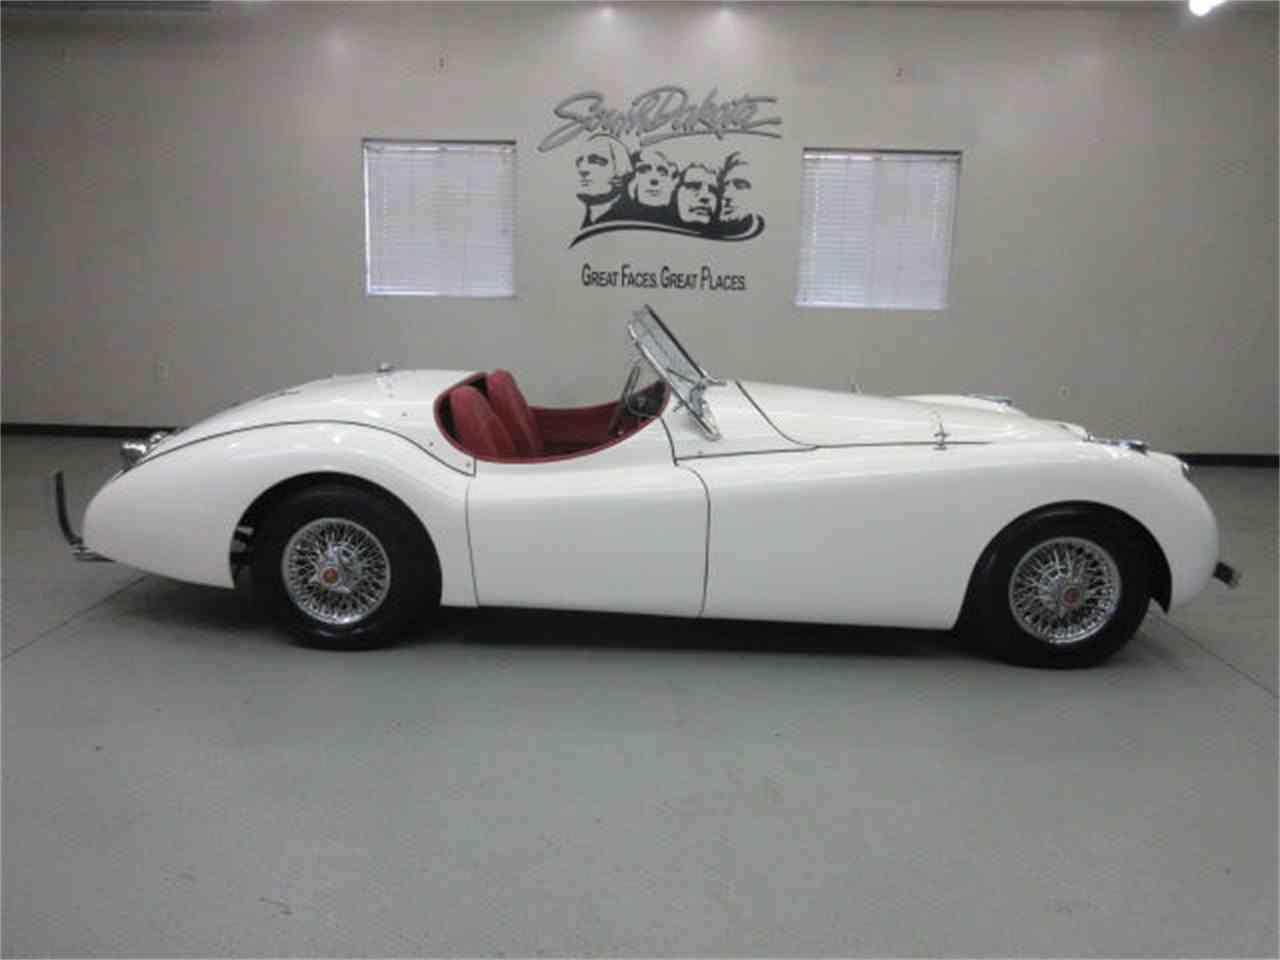 cars classifieds motor xk hemmings news sale dhc jaguar for se